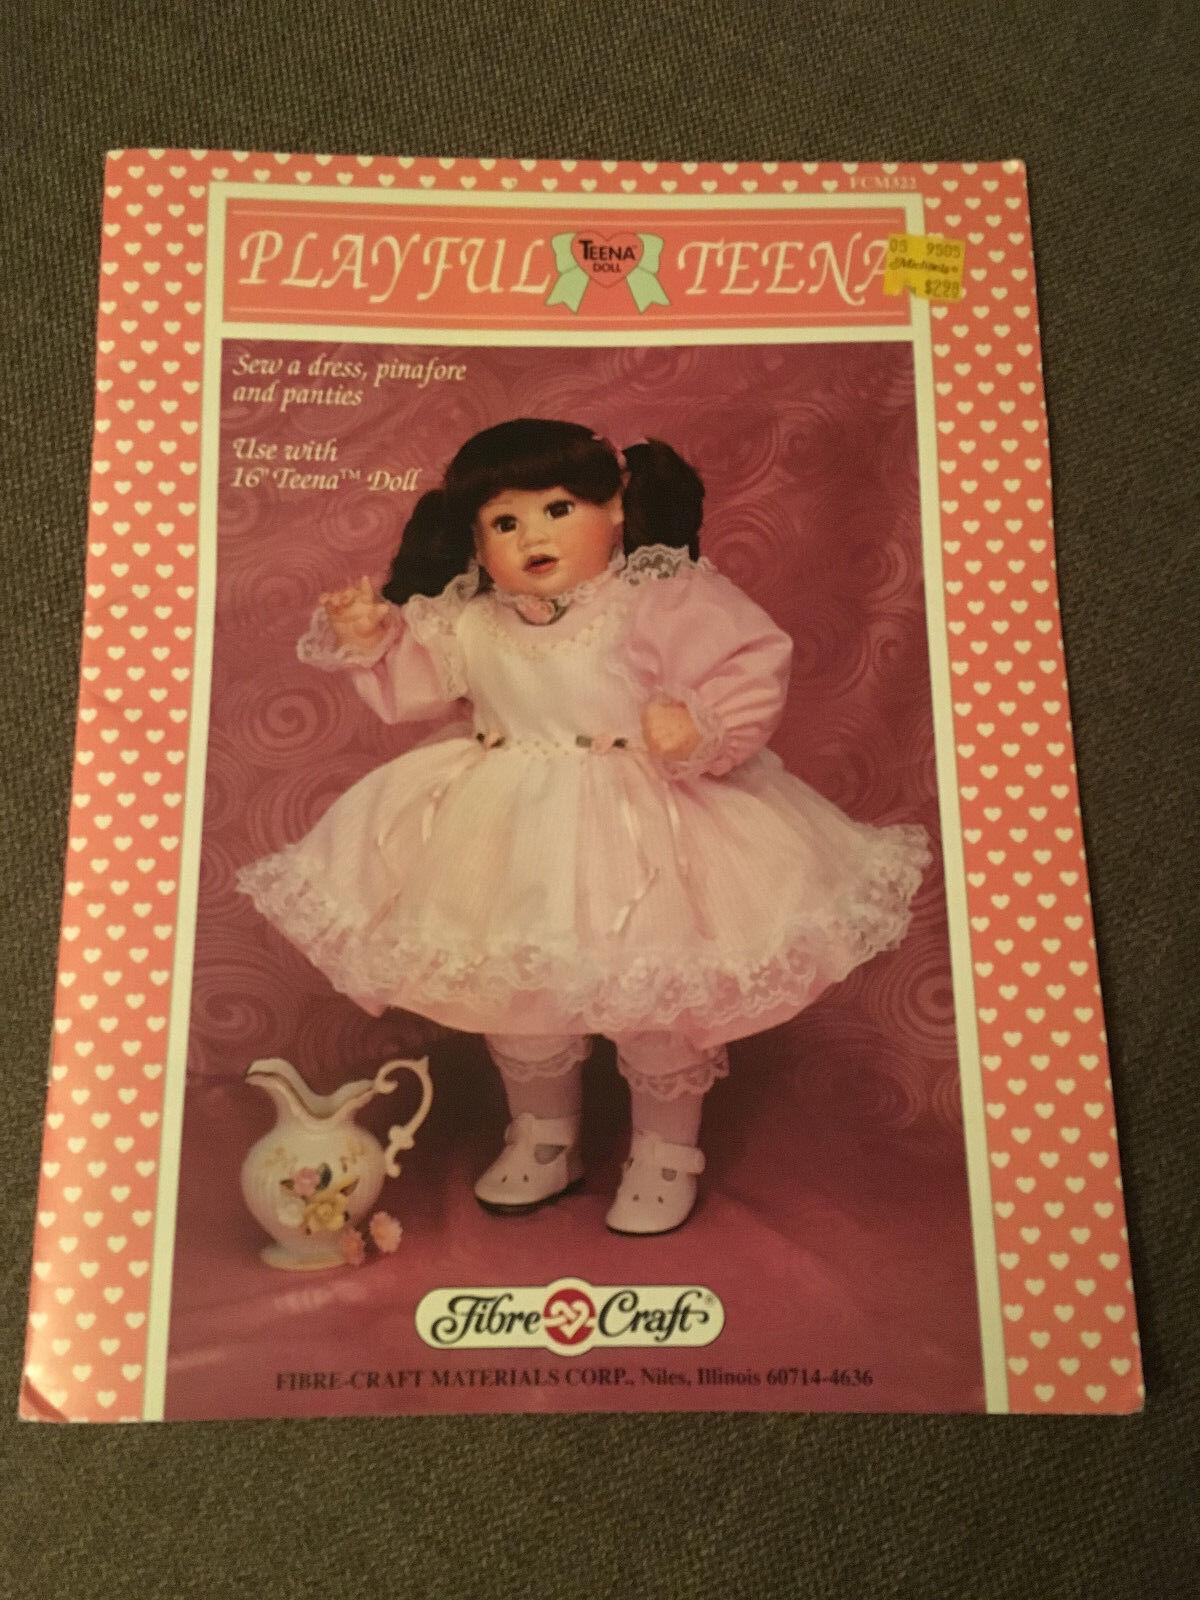 Fall Formal Dress for Barbie Doll Fibre Craft 269 Crochet PATTERN//INSTRUCTIONS